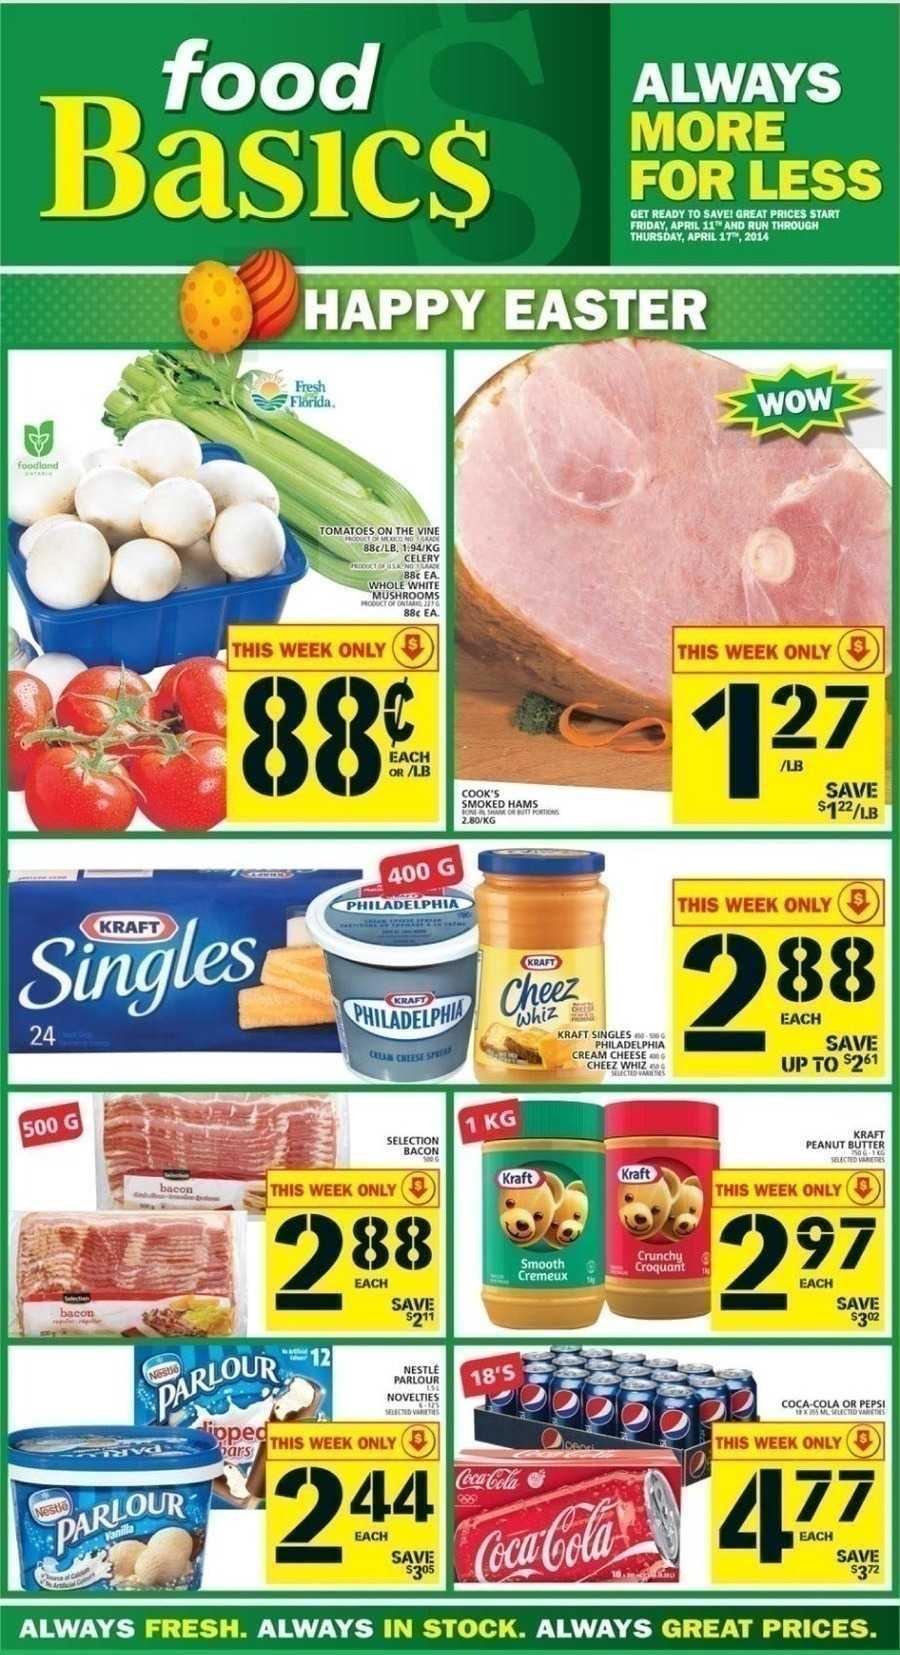 Weekly Flyer Of Food Basics